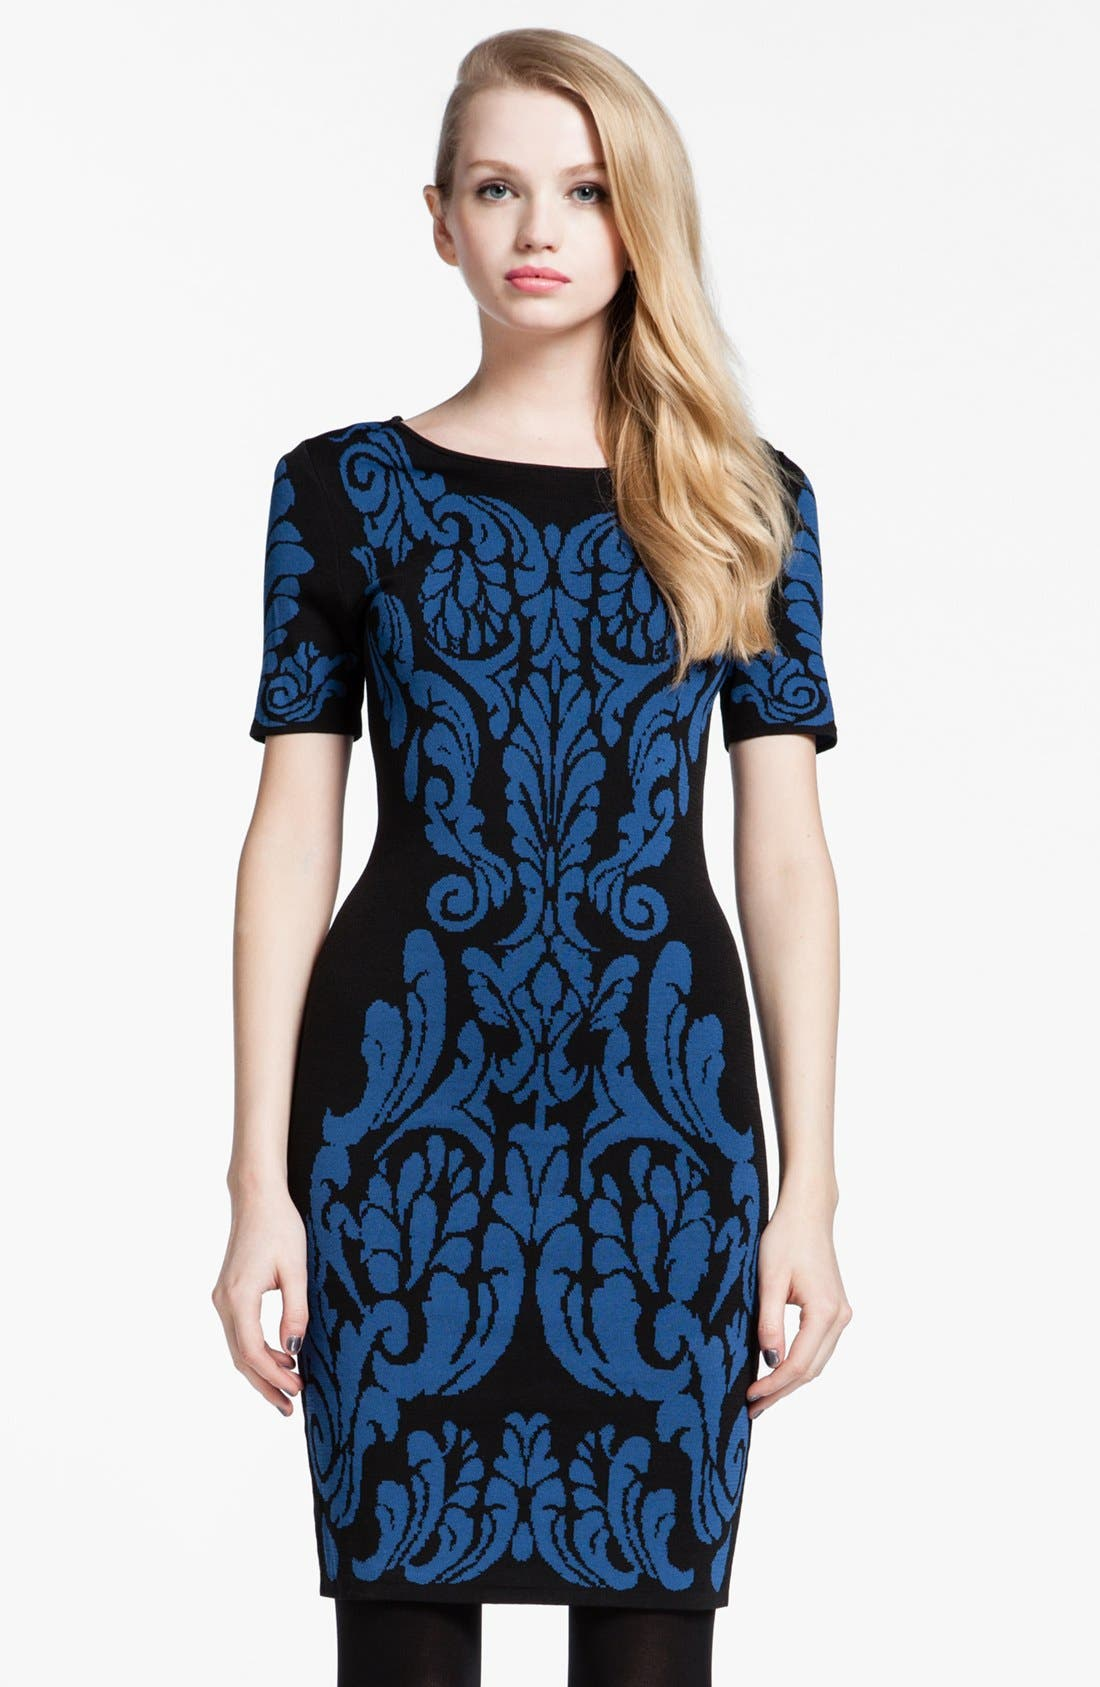 Alternate Image 1 Selected - Cynthia Steffe 'Briella' Patterned Sweater Dress